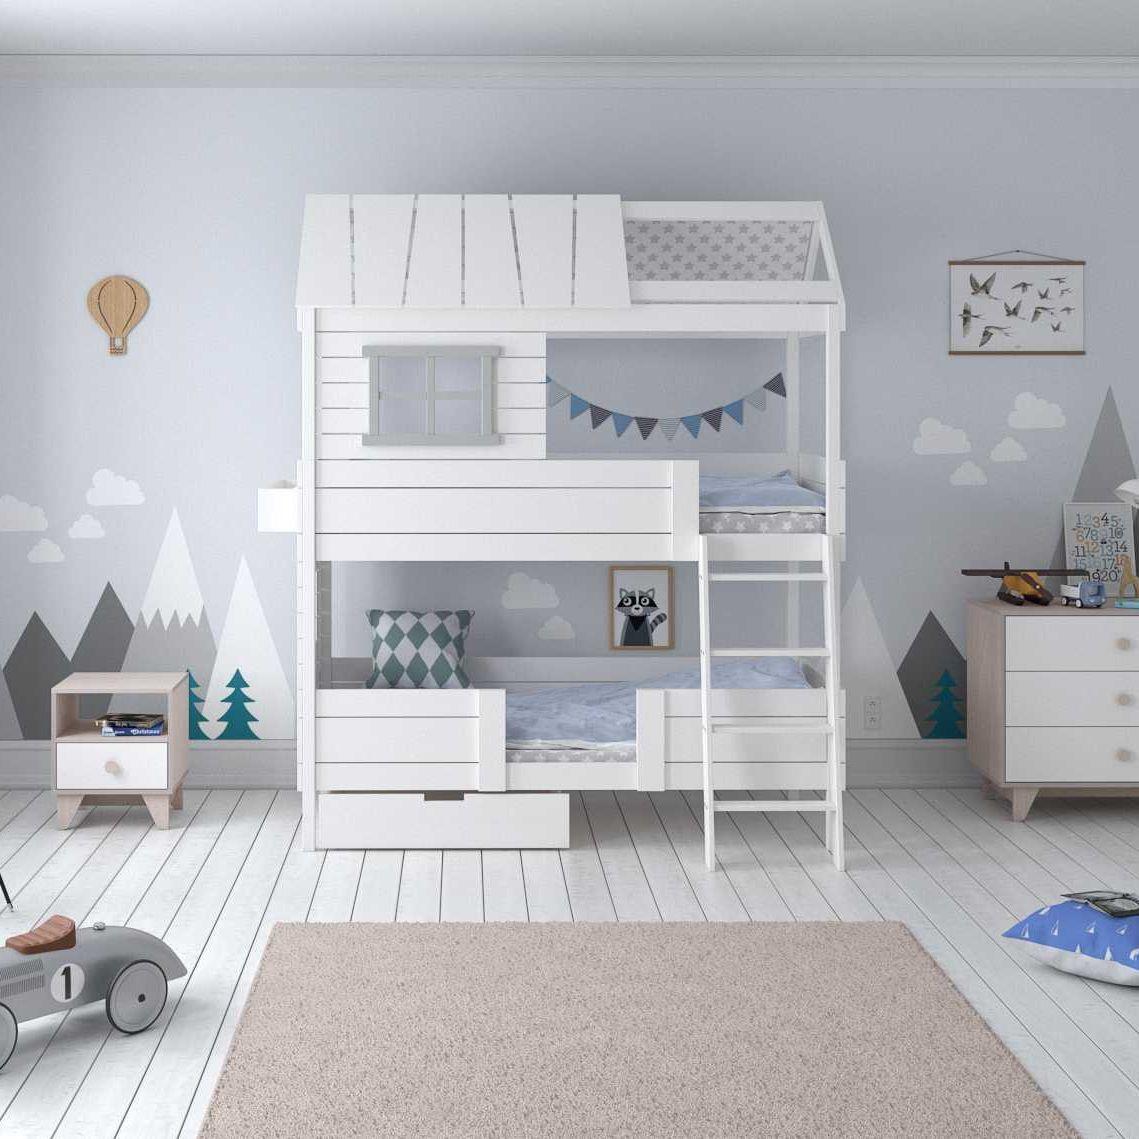 Kinderzimmer Junge 2 Jahre Gestalten Check More At Http Cakhd